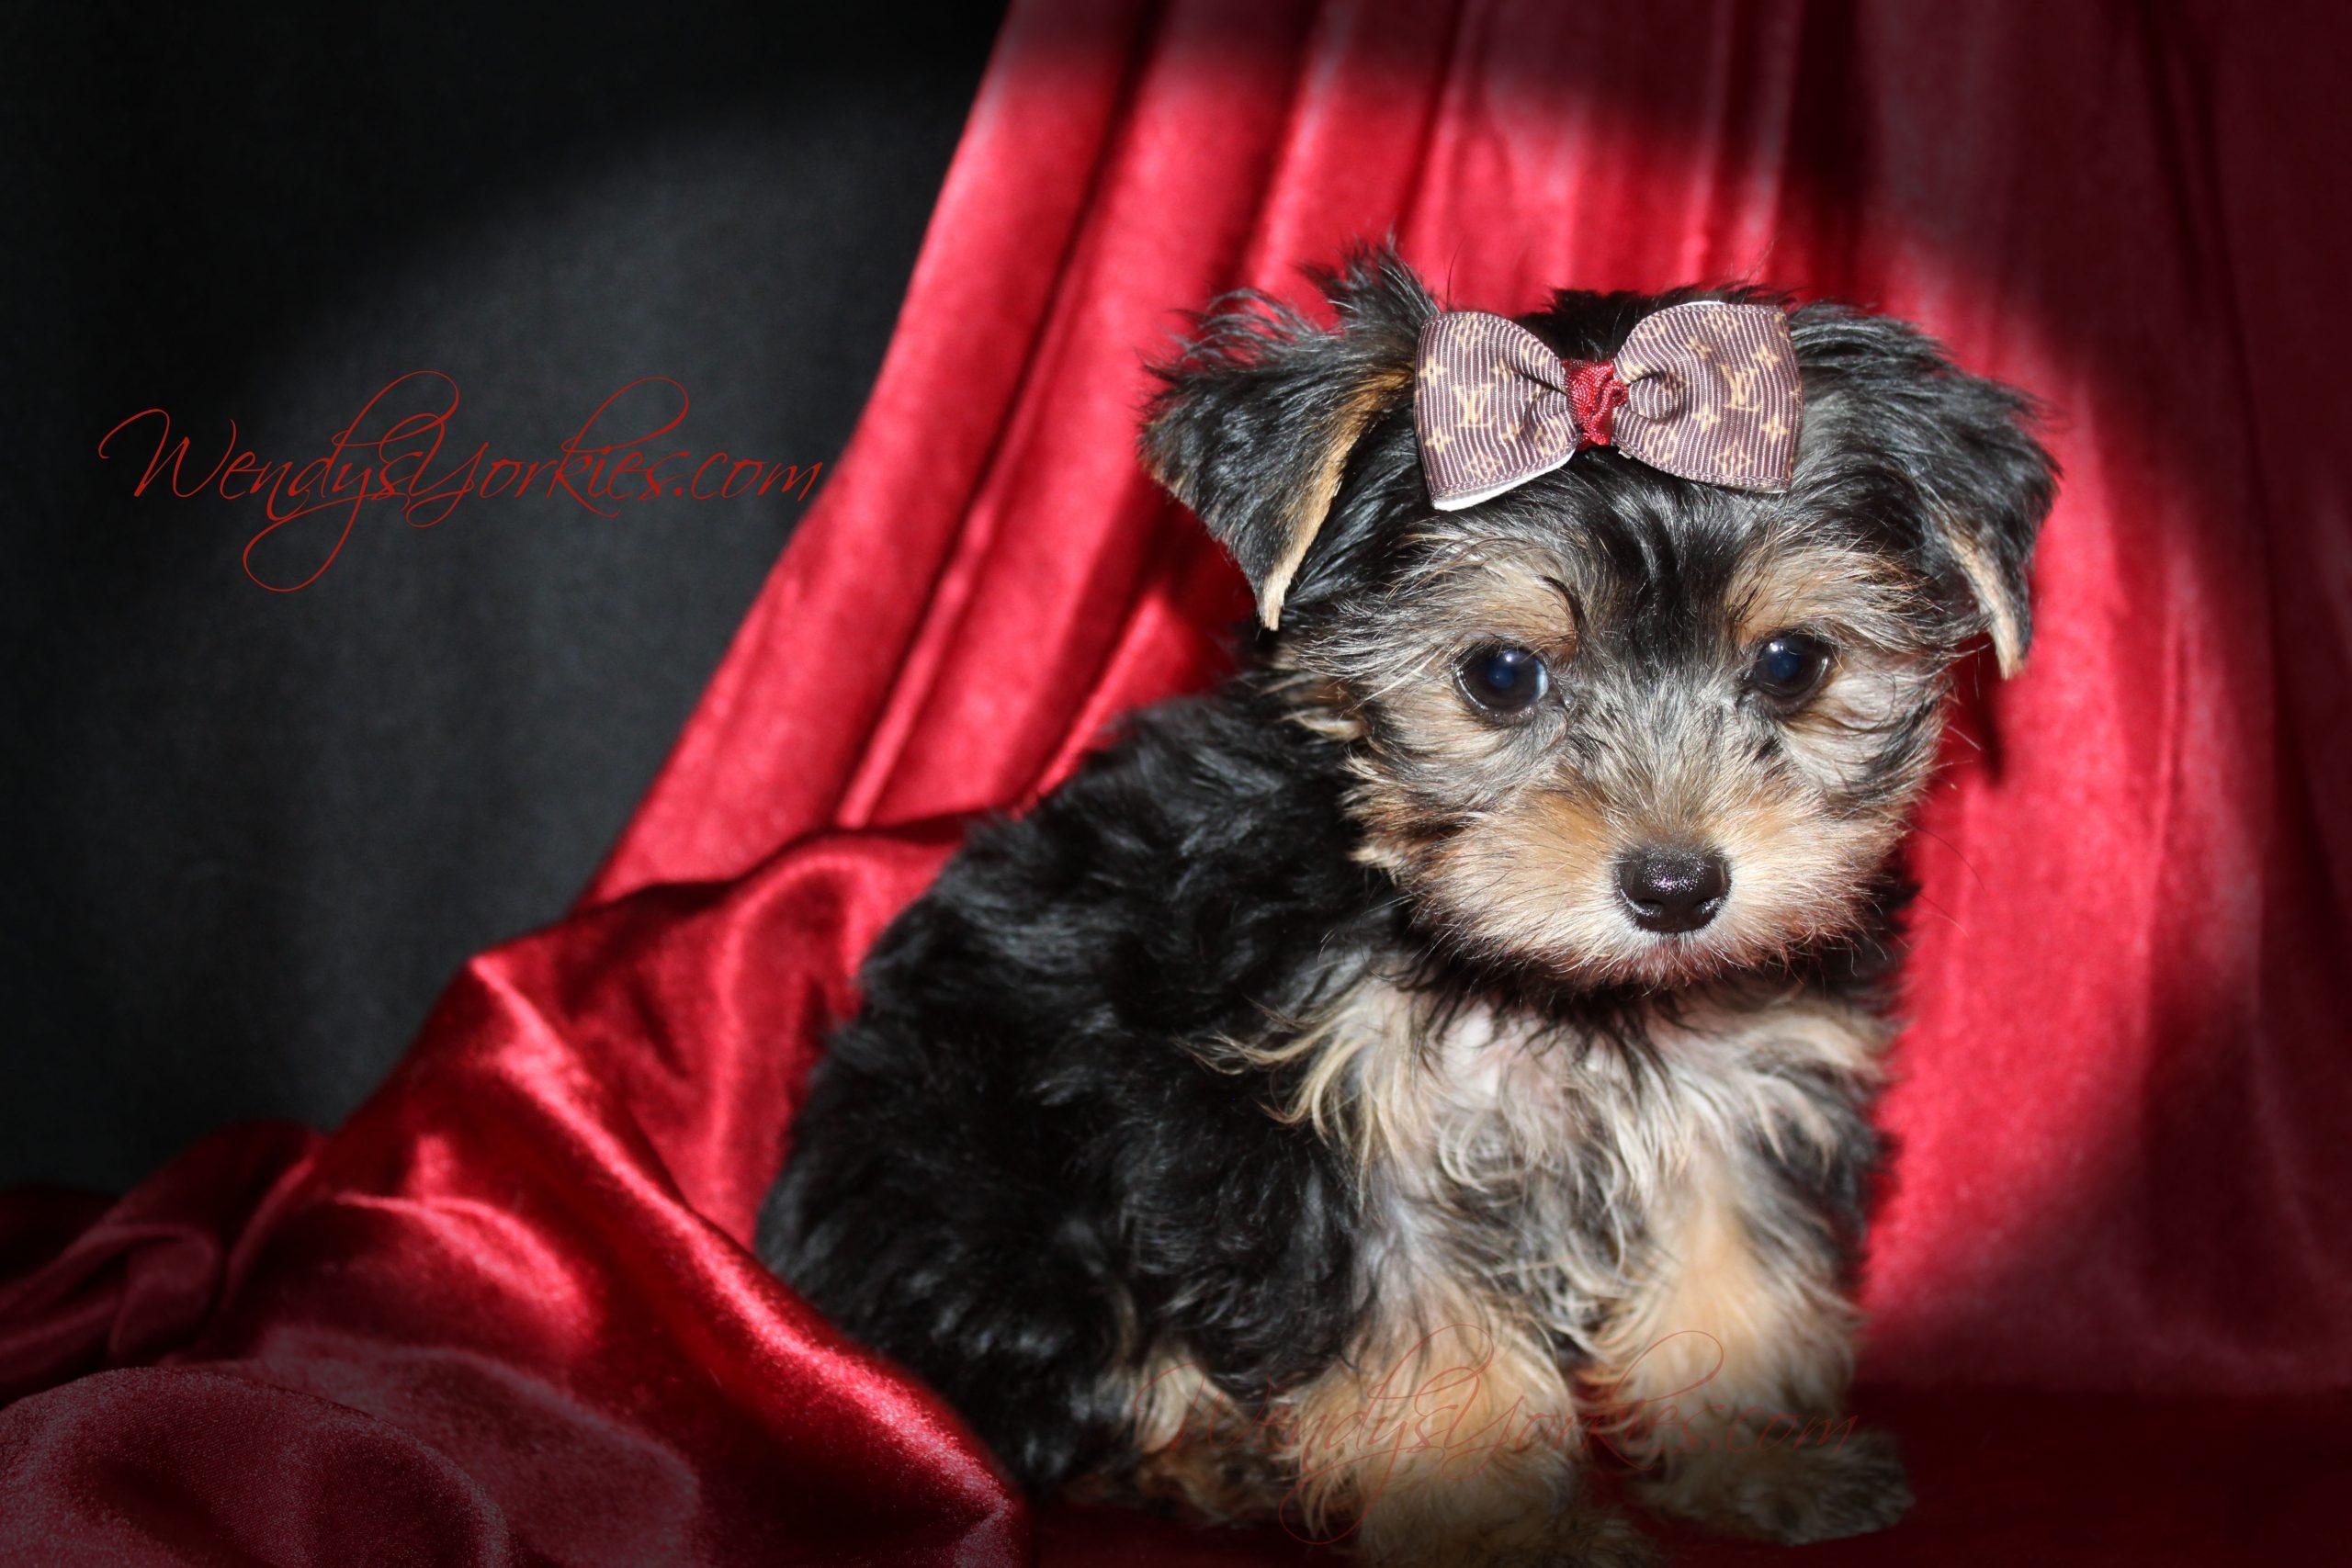 Yorkie puppy for sale, Phoebe m2, WendysYorkies.com